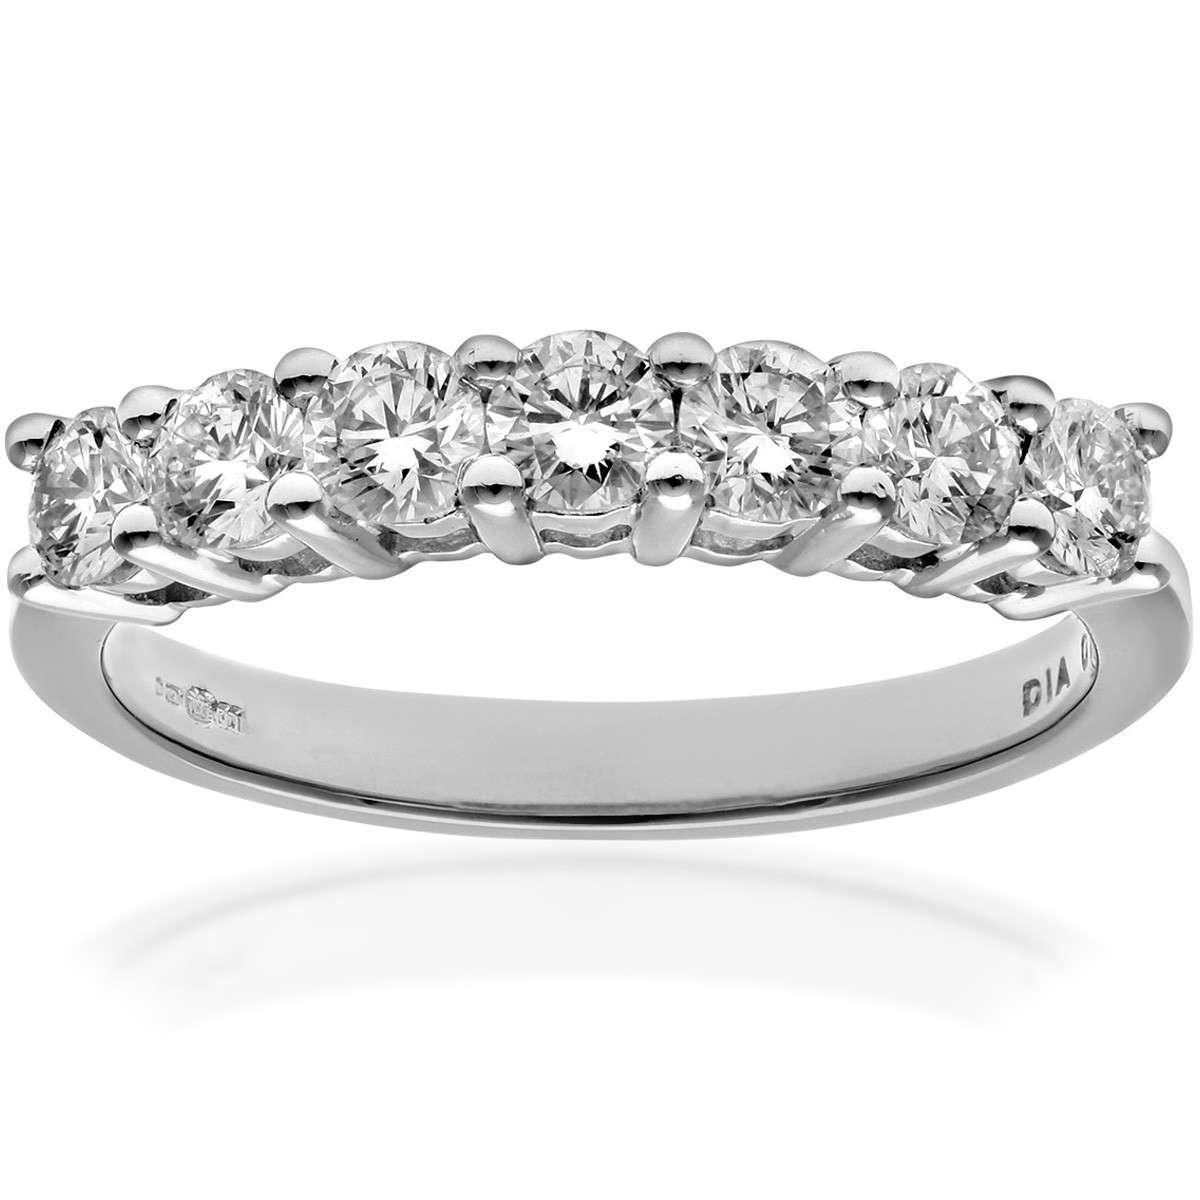 18CT WHITE GOLD 0.75CT DIAMOND 7 STONE 1/2 ETERNITY RING